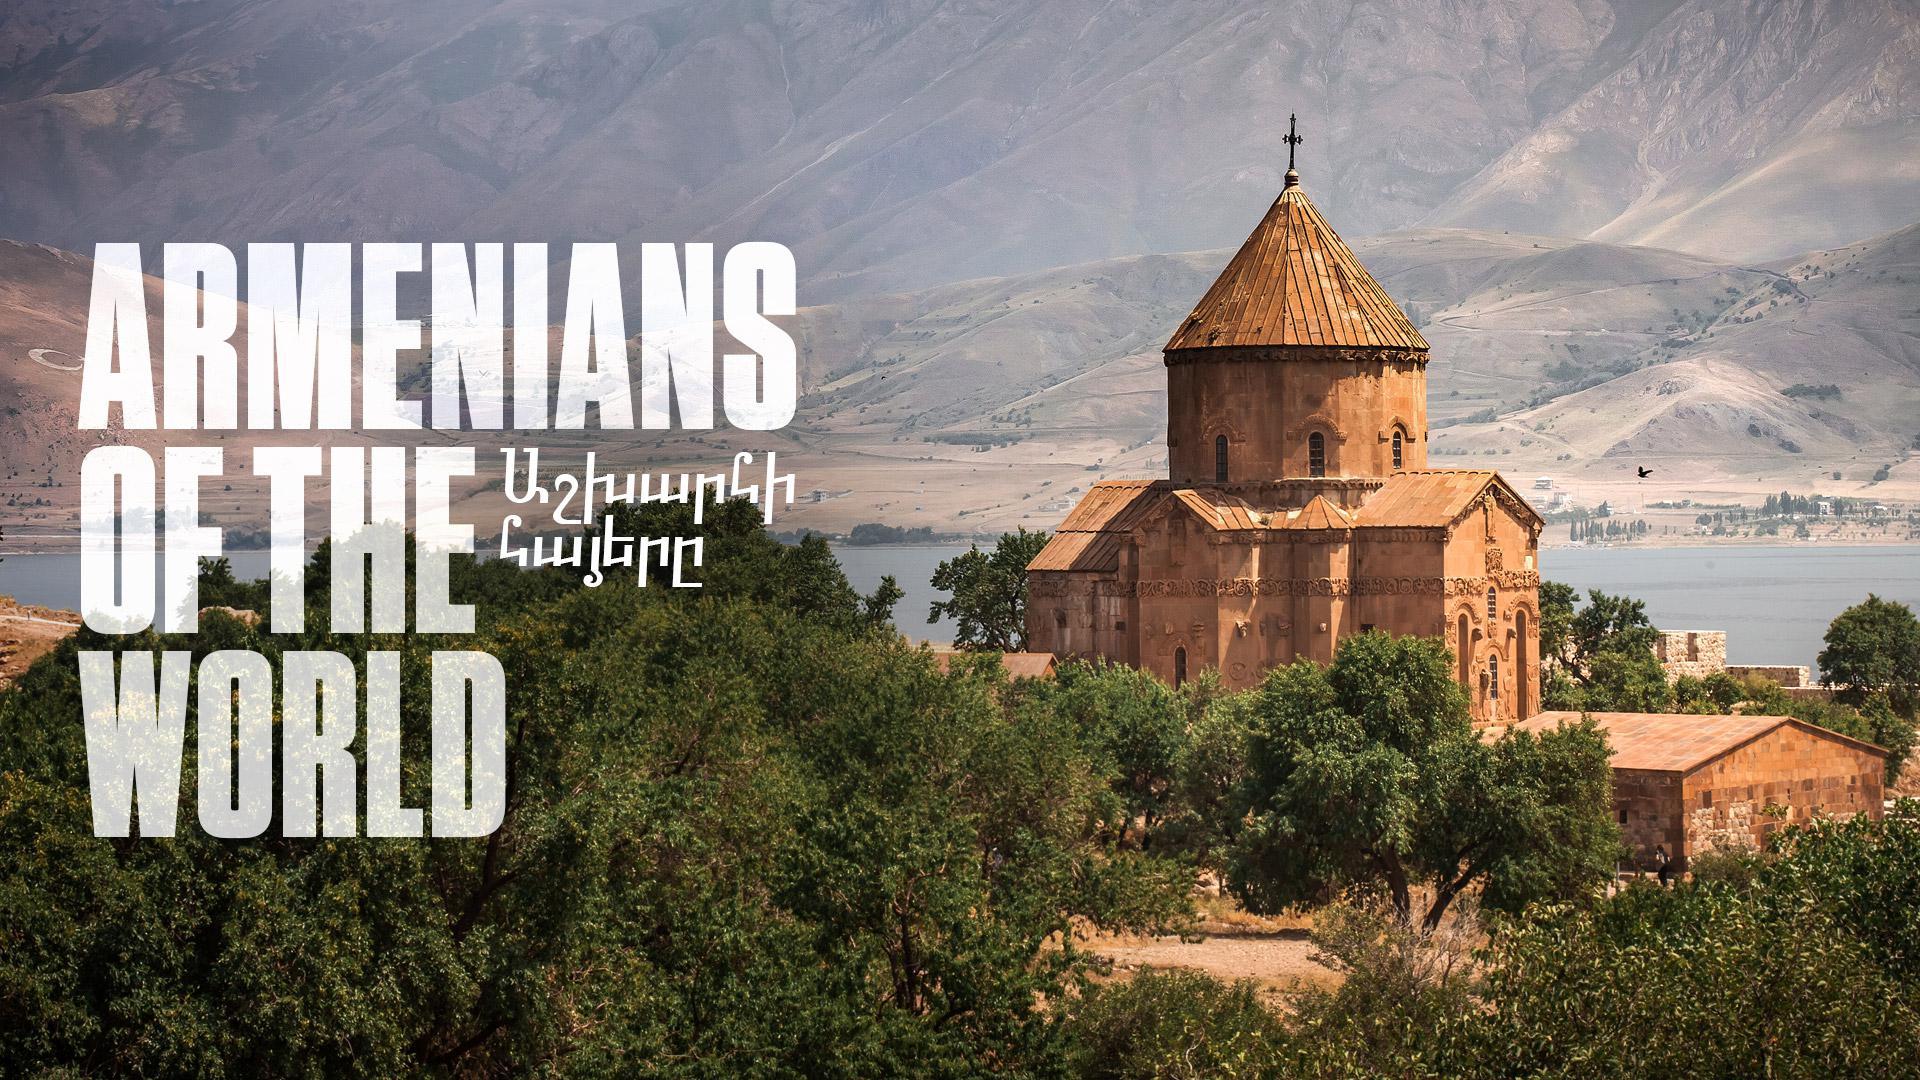 Armenians of the World